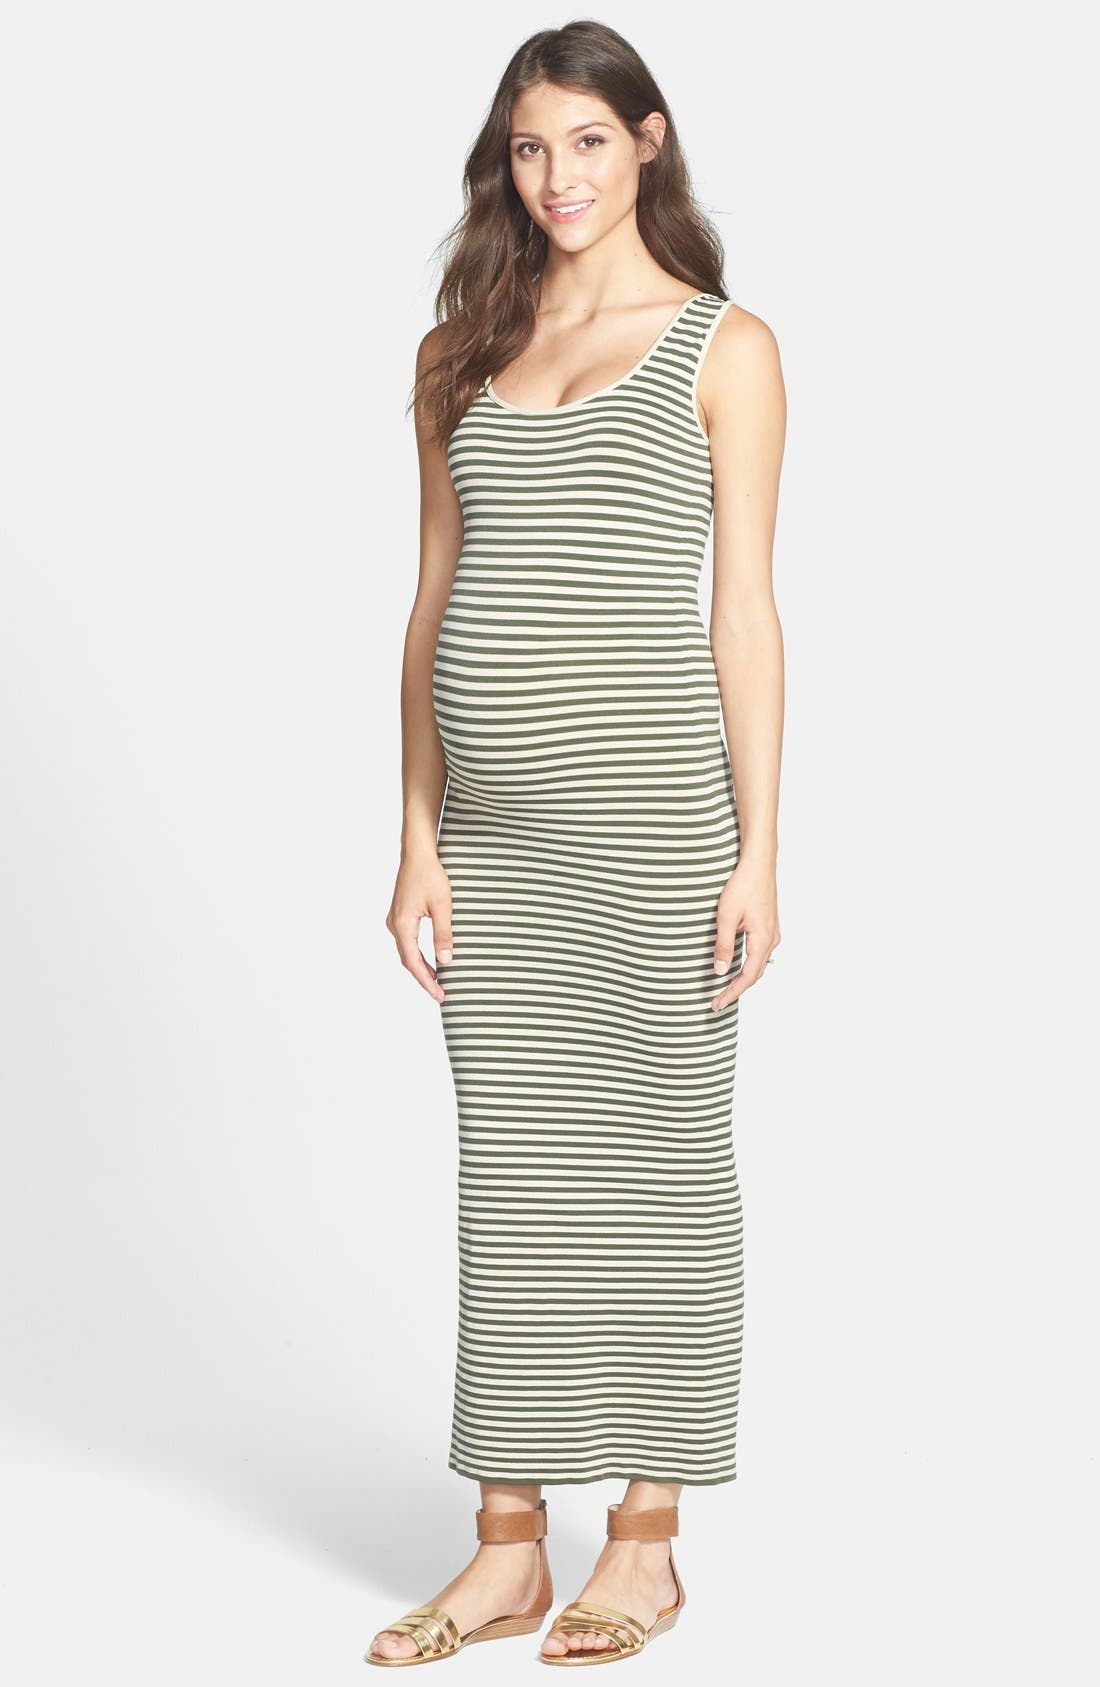 Micro Stripe Maternity Dress,                             Main thumbnail 1, color,                             300